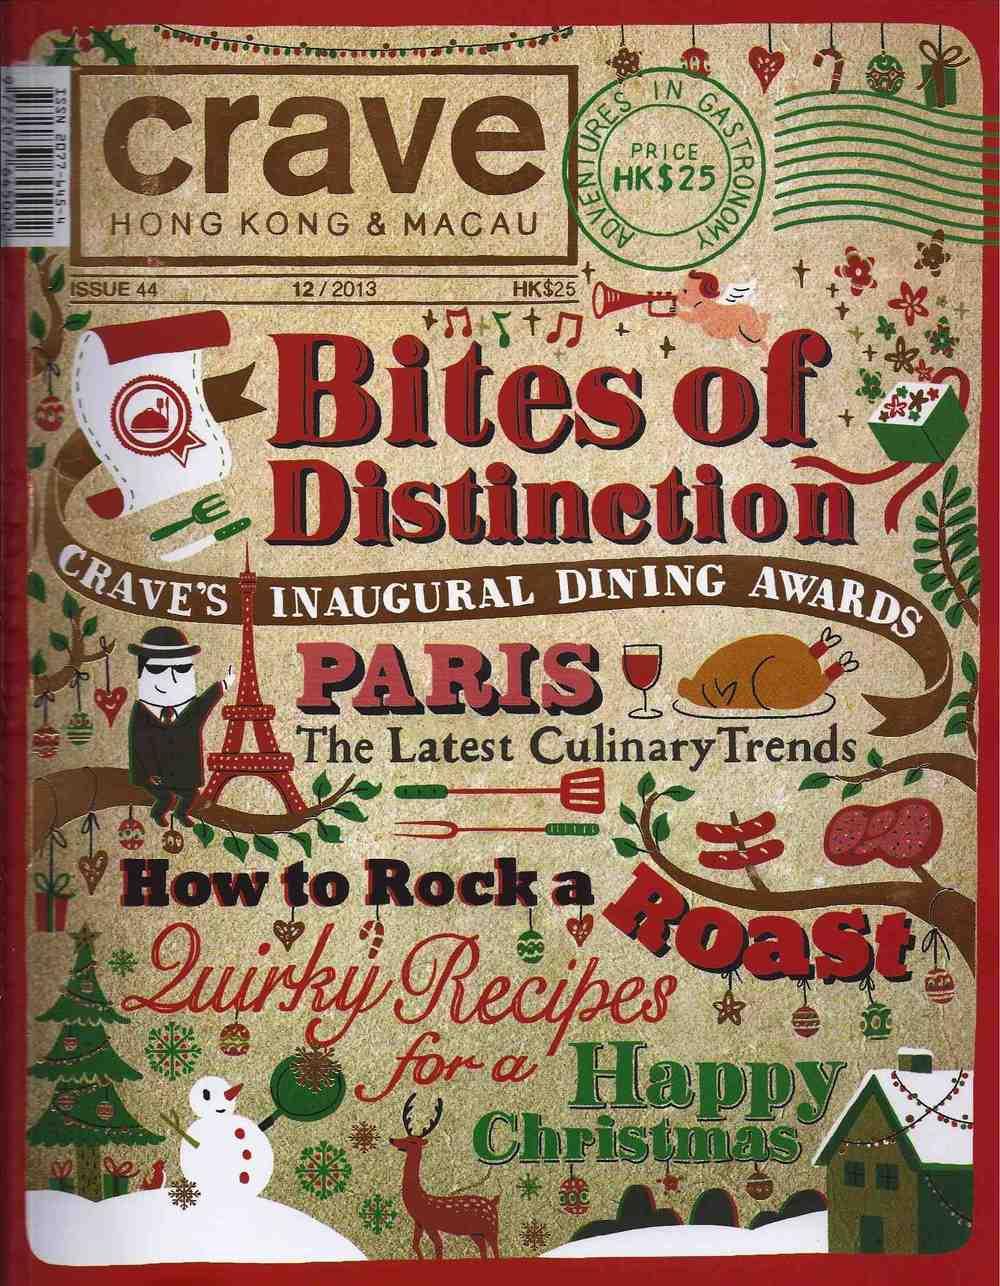 2013-12 Crave 01.jpg